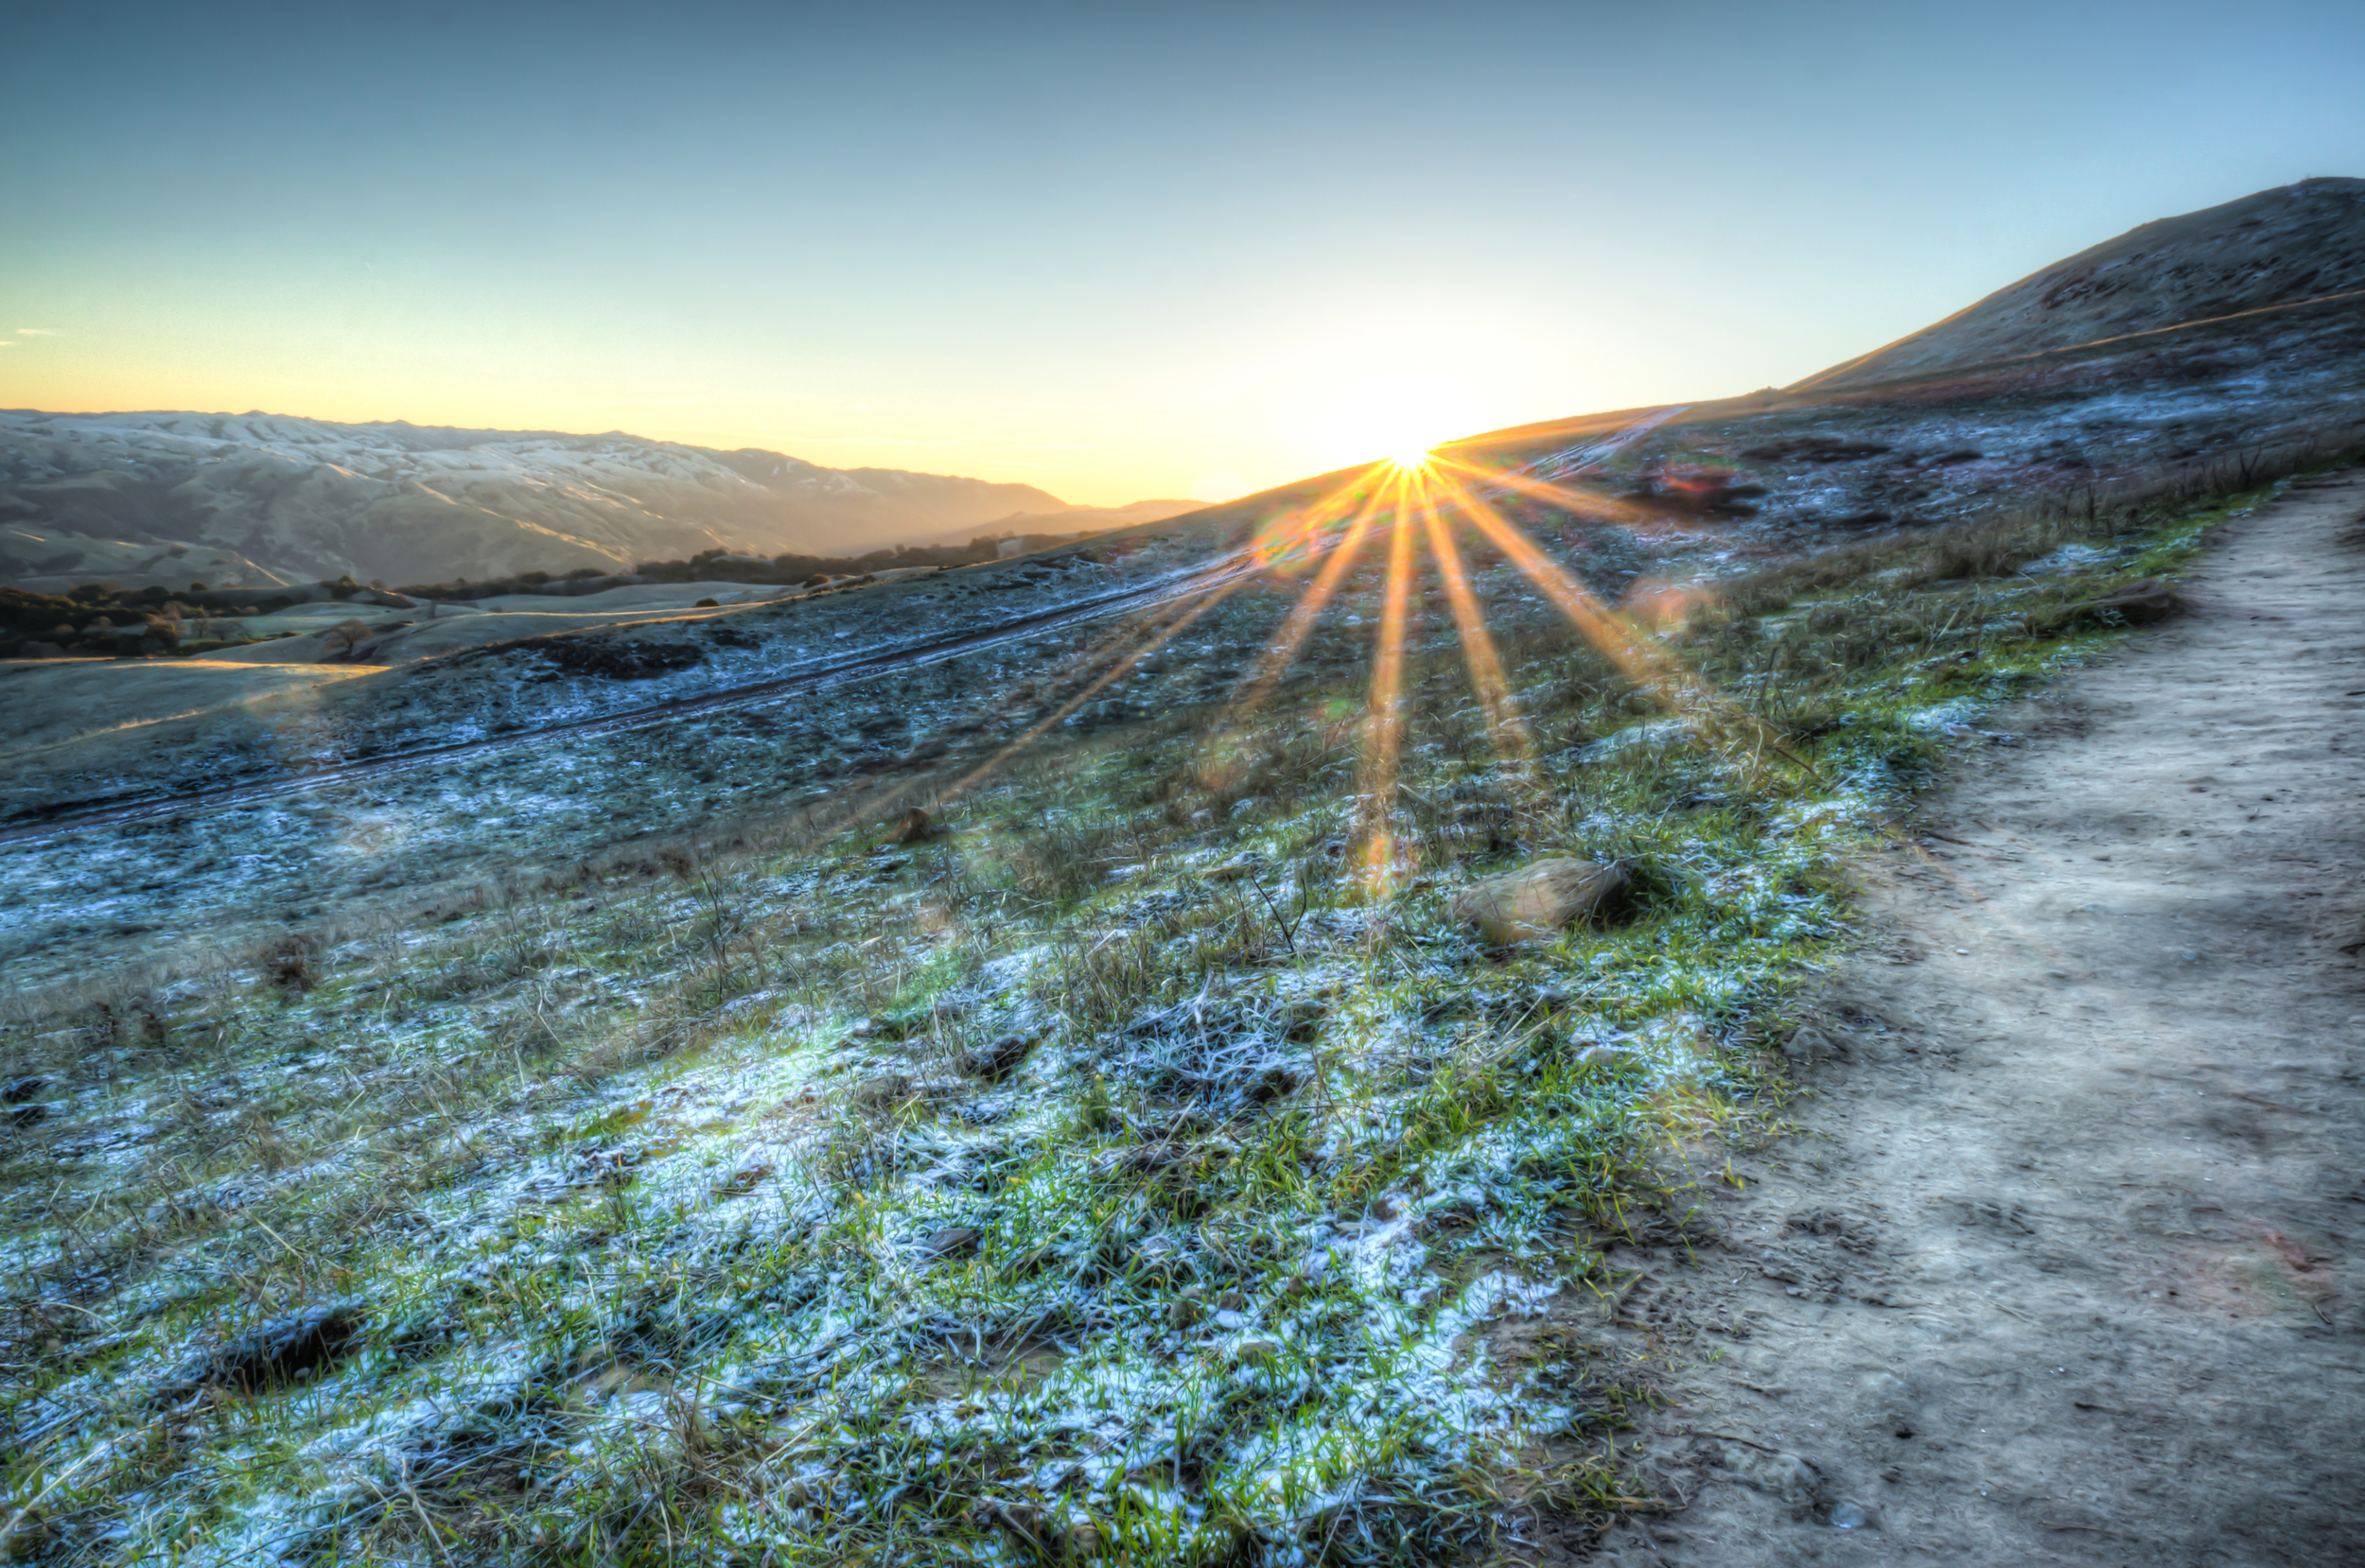 Sunrise at Mission Peak, California